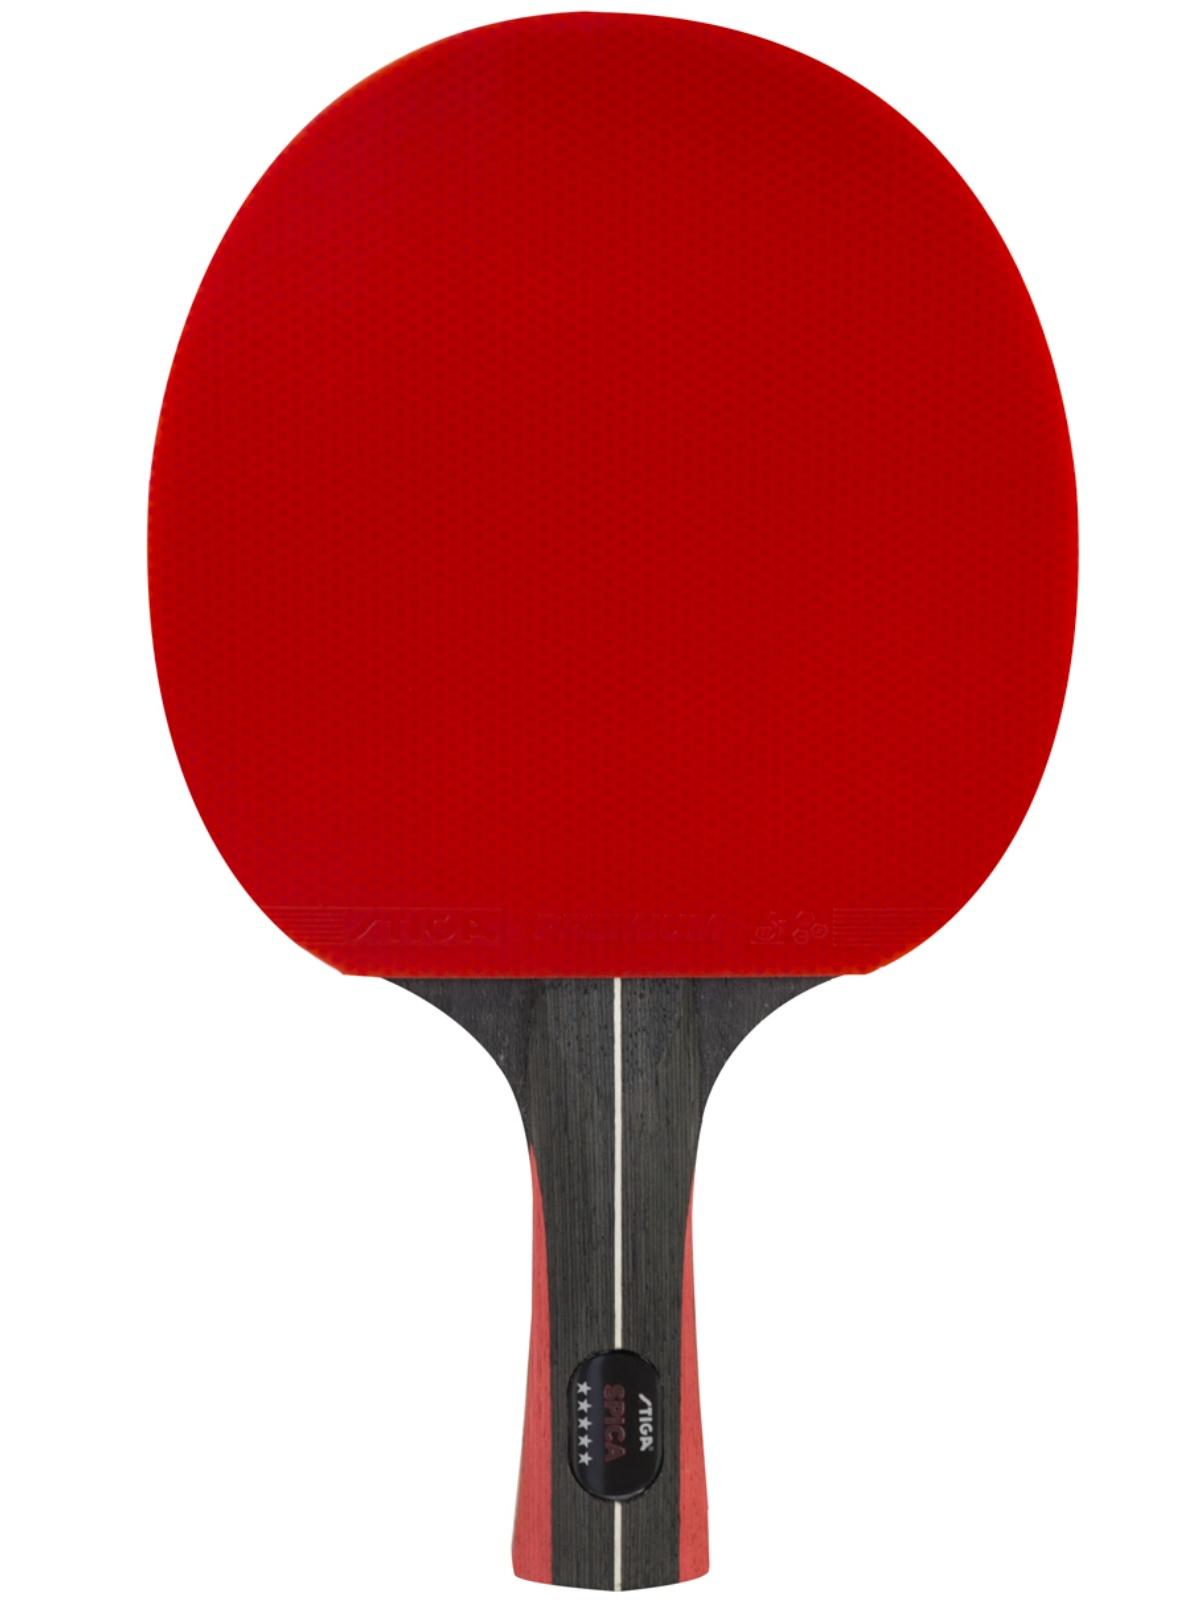 Pálka na stolní tenis STIGA Spica